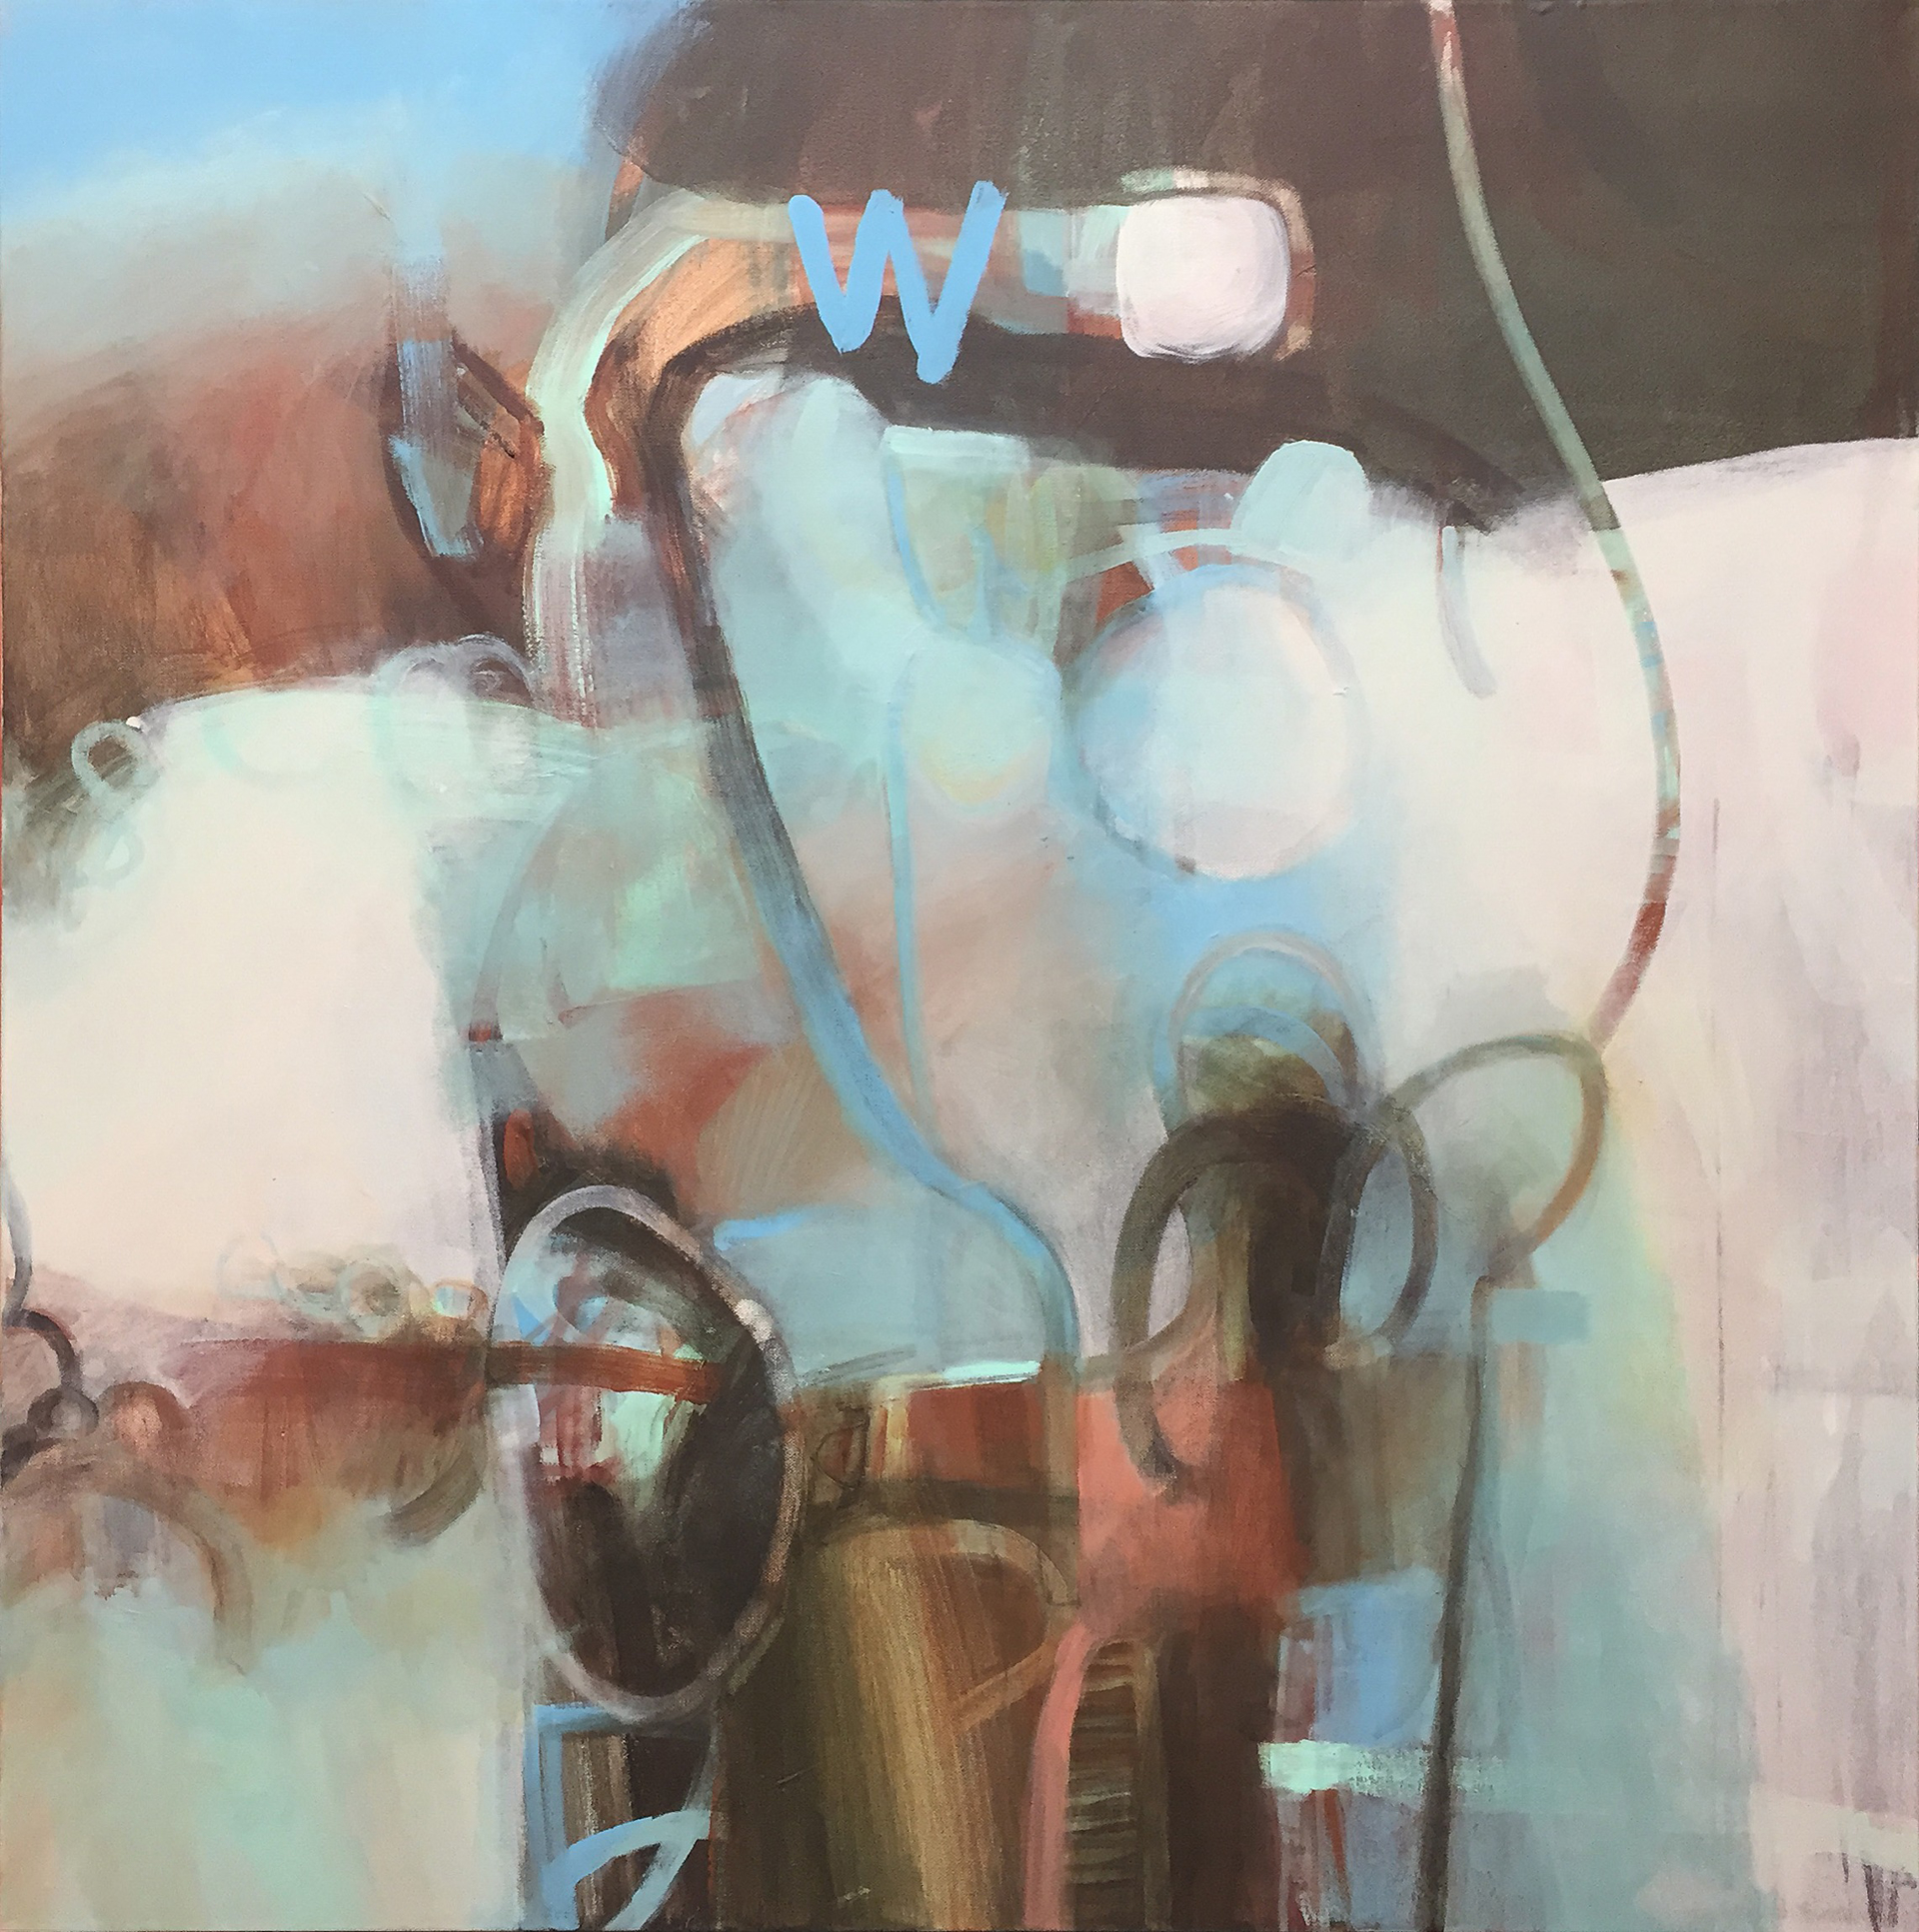 Untitled 174715 by Karen Roehl